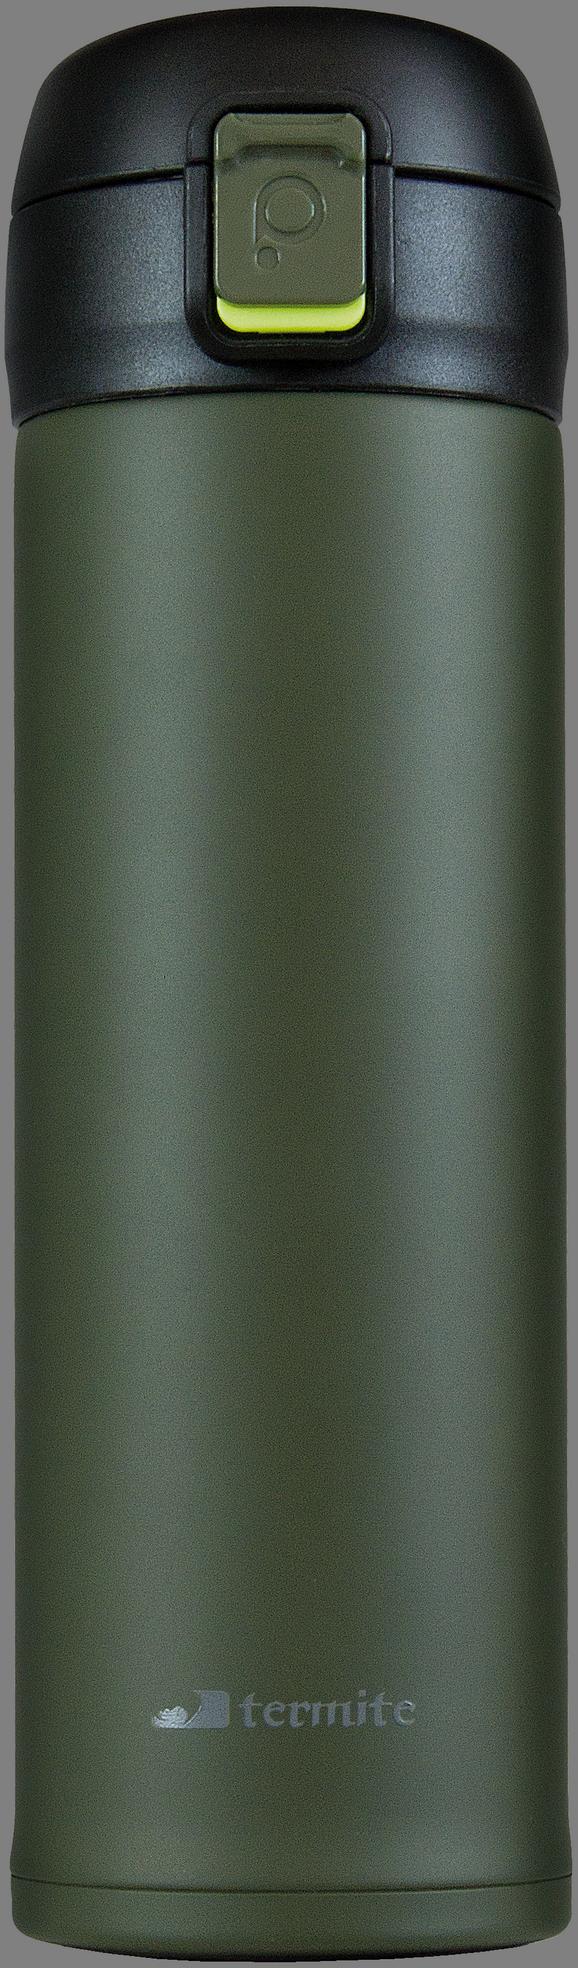 bluff-480-greenblackhd